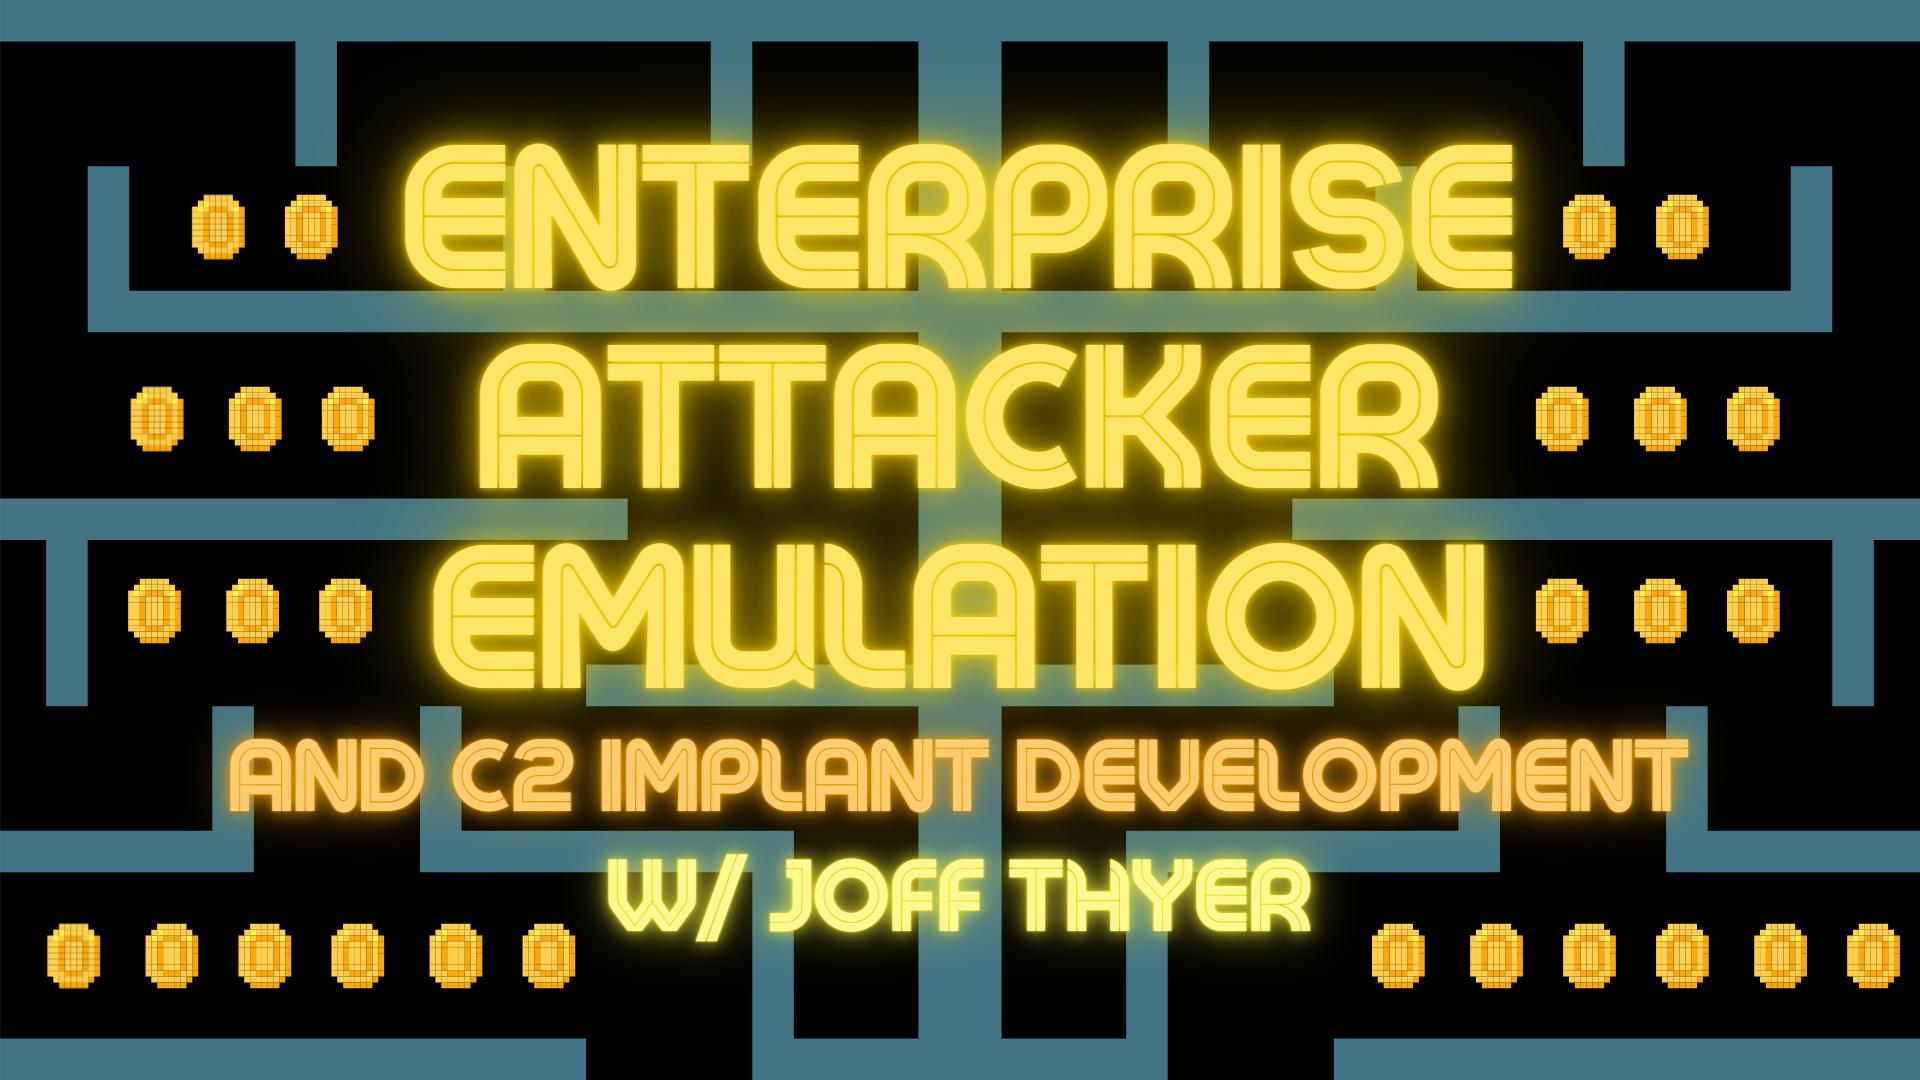 Enterprise Attacker Emulation